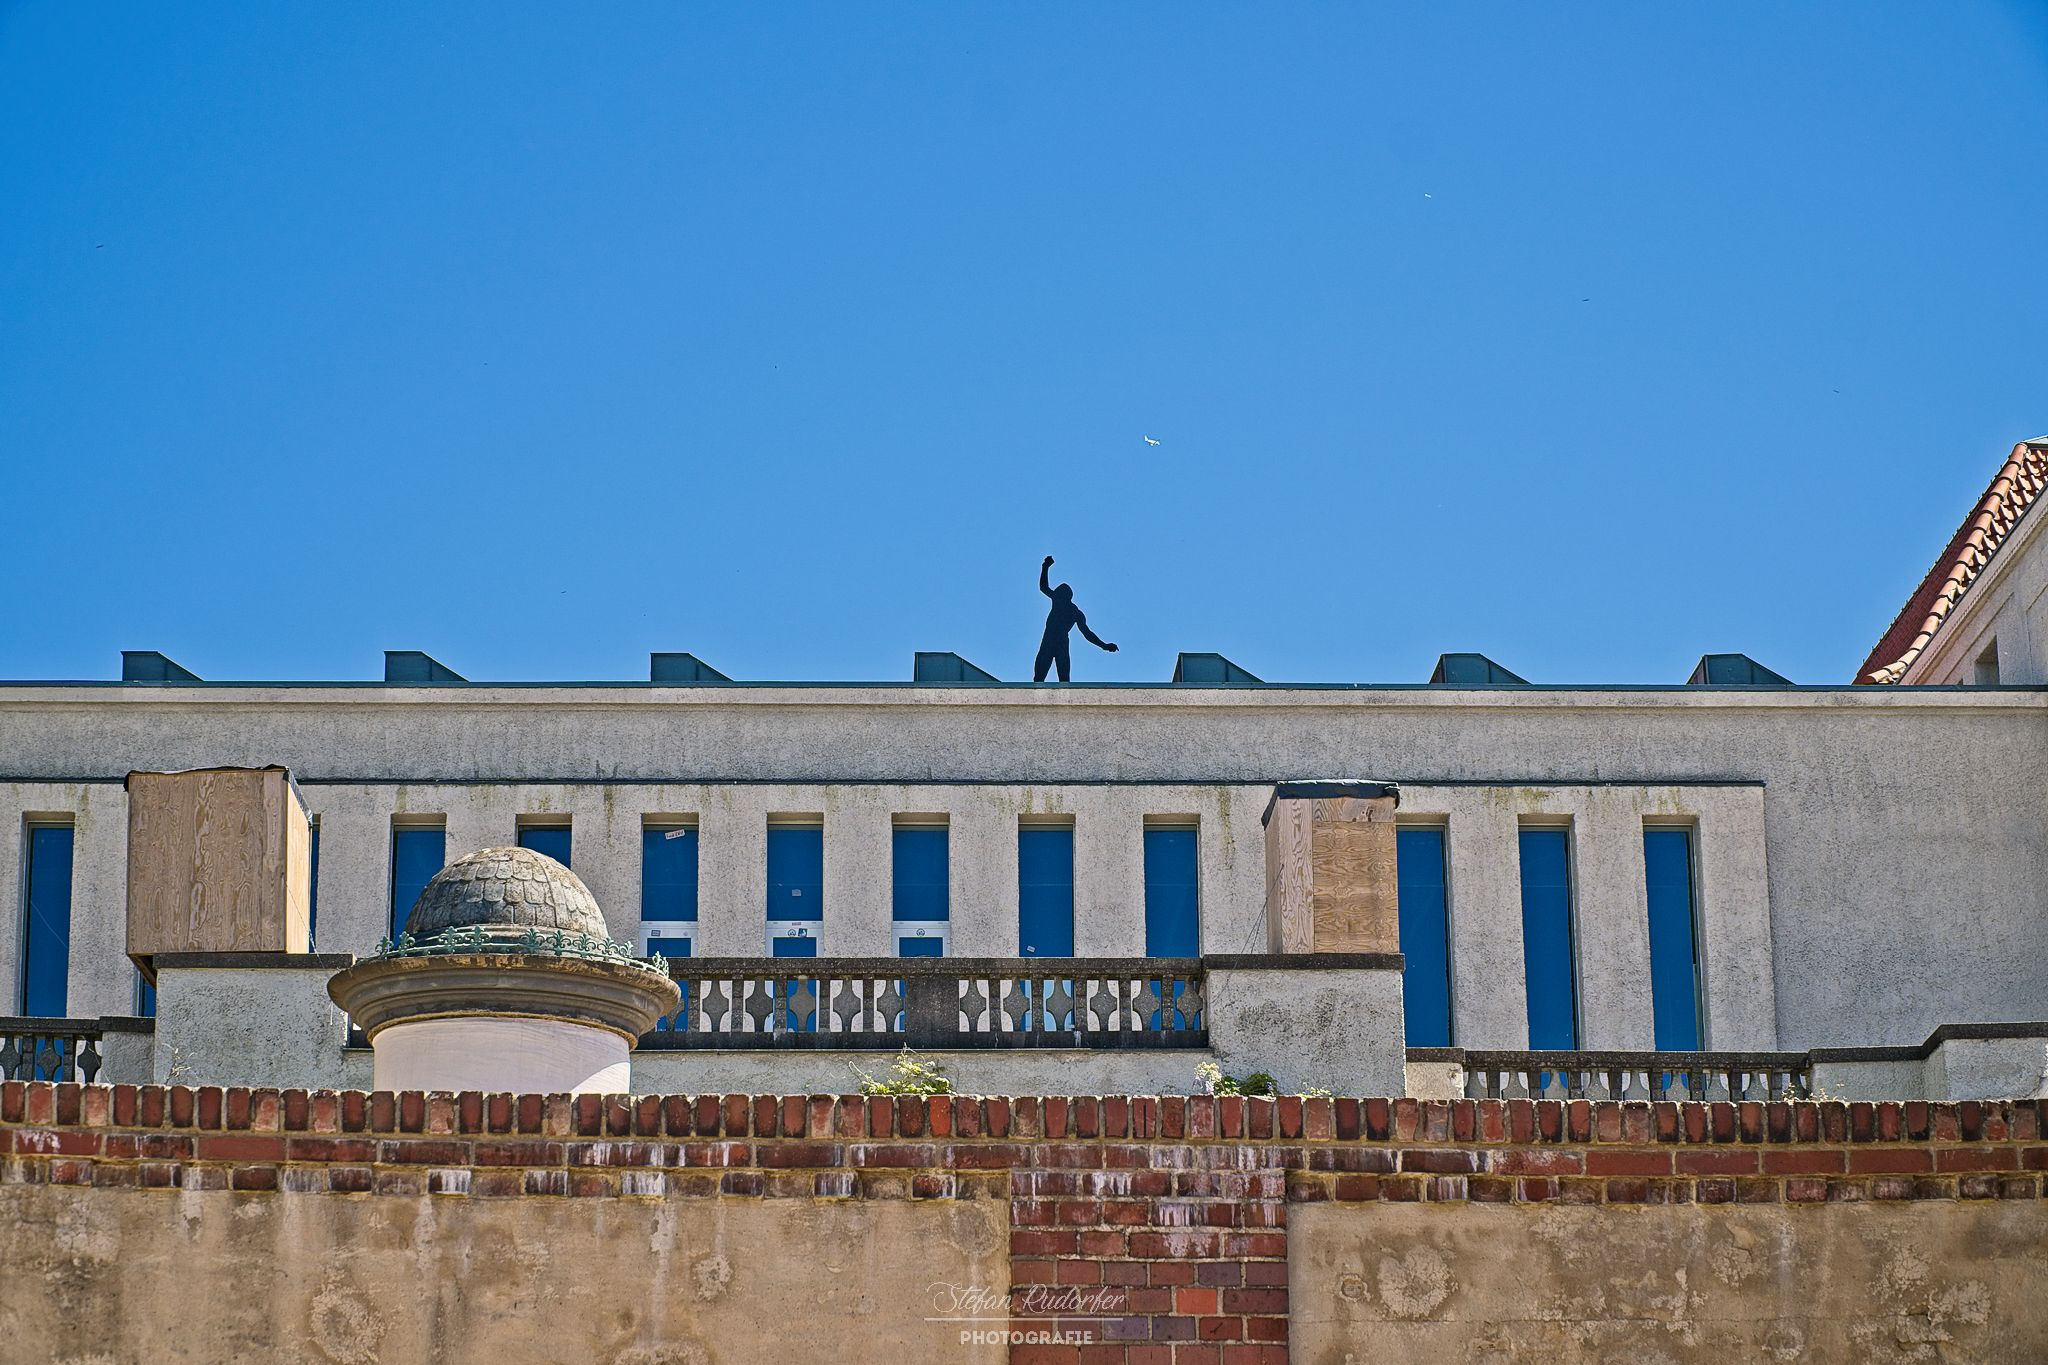 Figur auf dem Dach